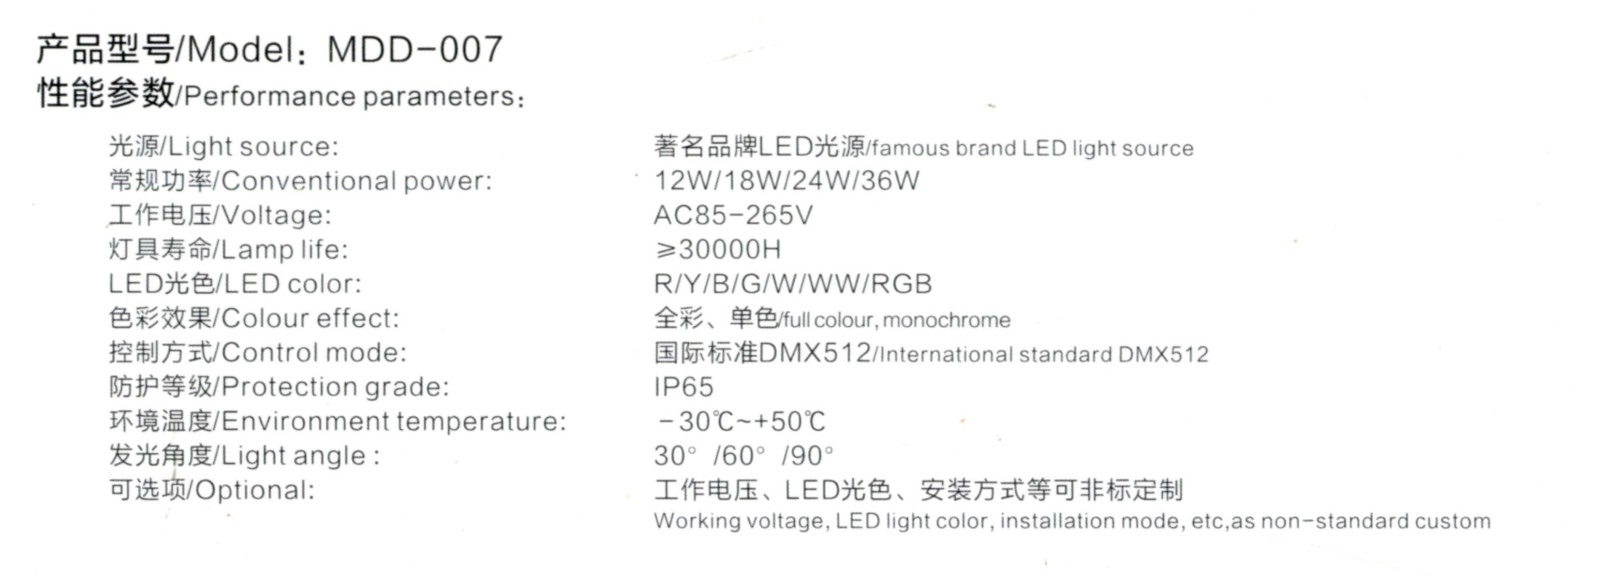 LED埋地灯Model∶MDD-007参数.jpg